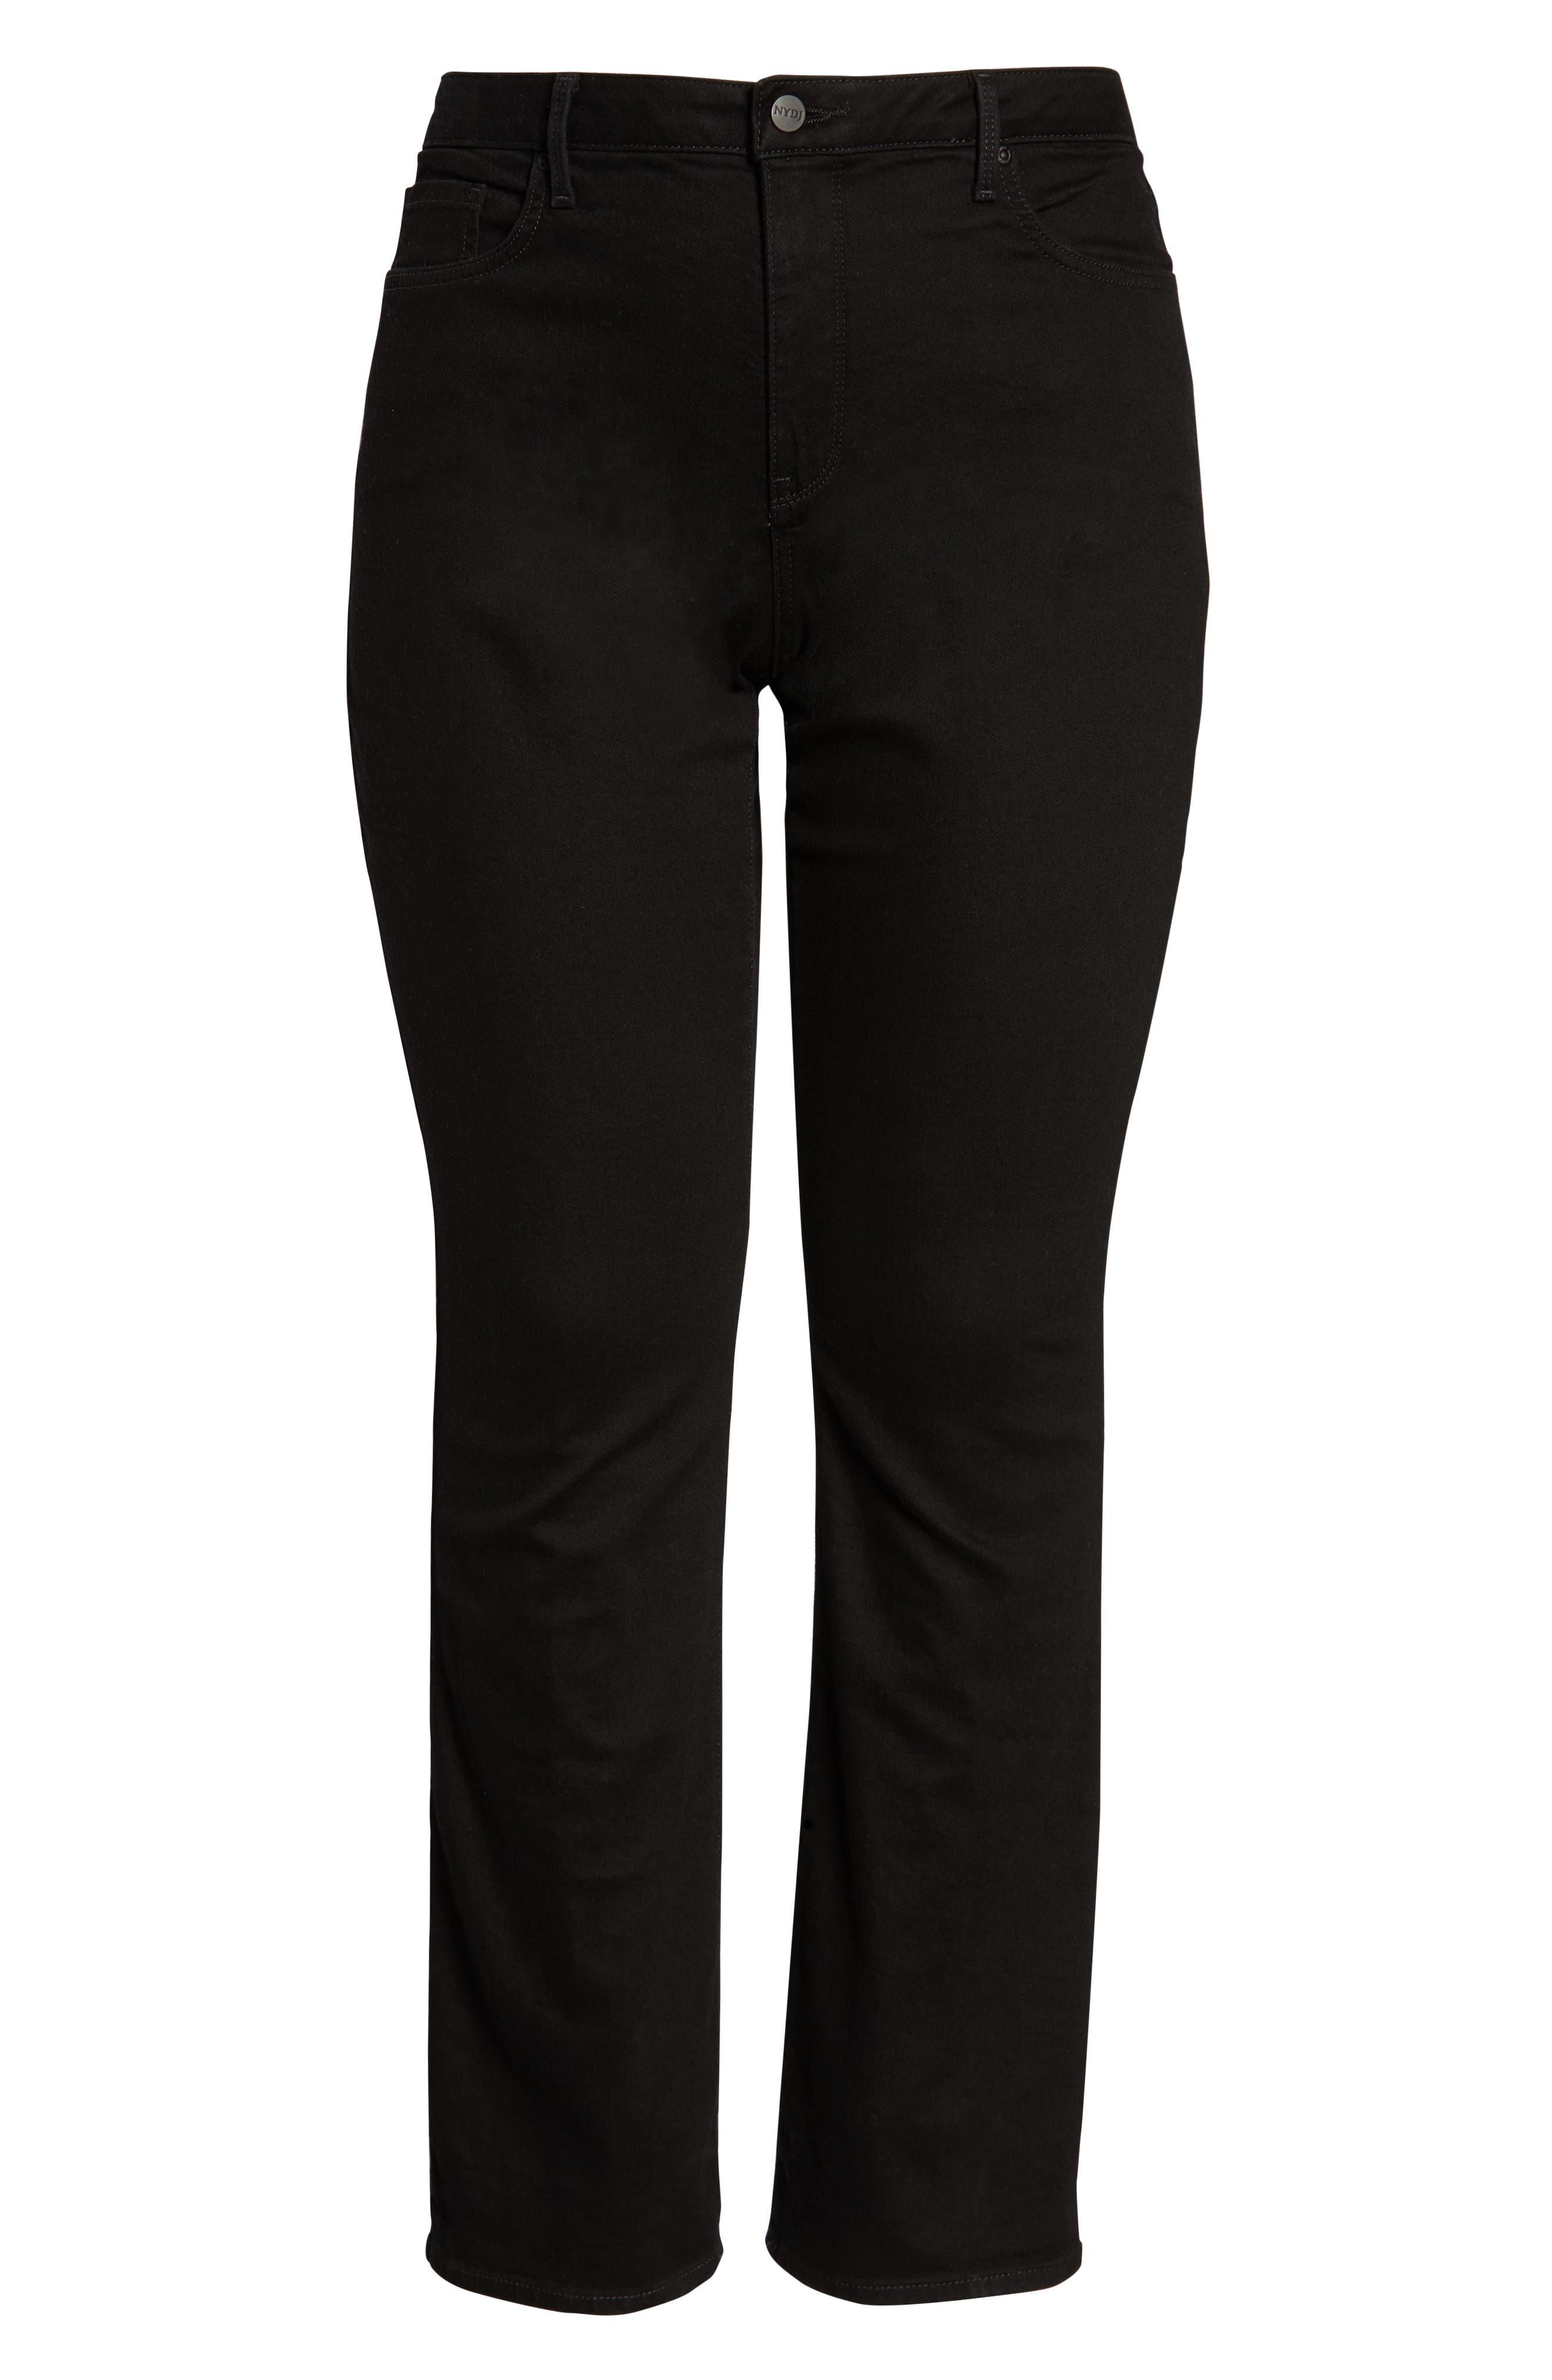 NYDJ, Barbara High Rise Bootcut Jeans, Alternate thumbnail 6, color, BLACK